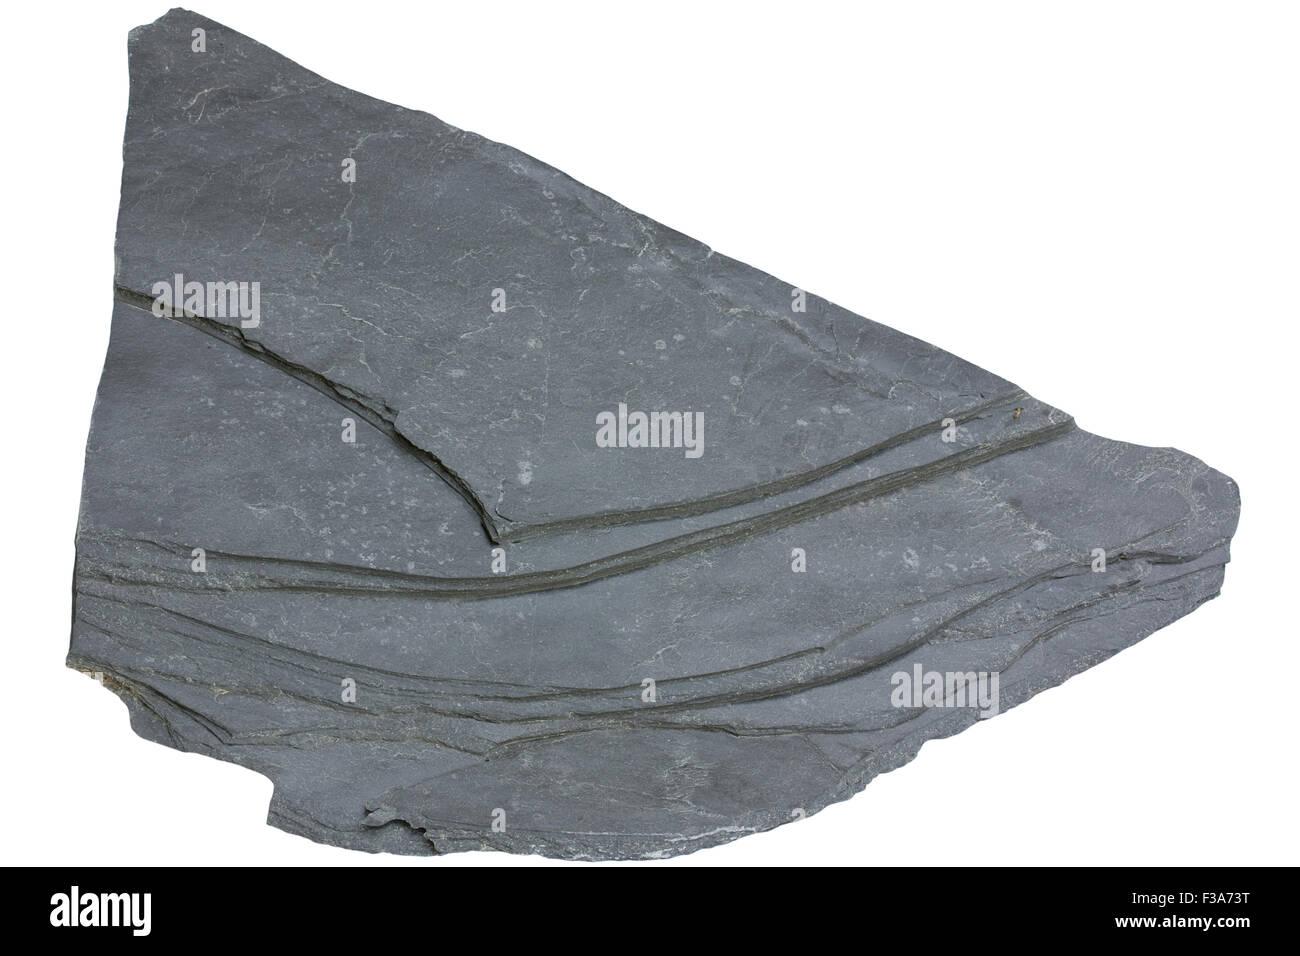 Slate (foliated metamorphic rock, metamorphosed shale) - Stock Image